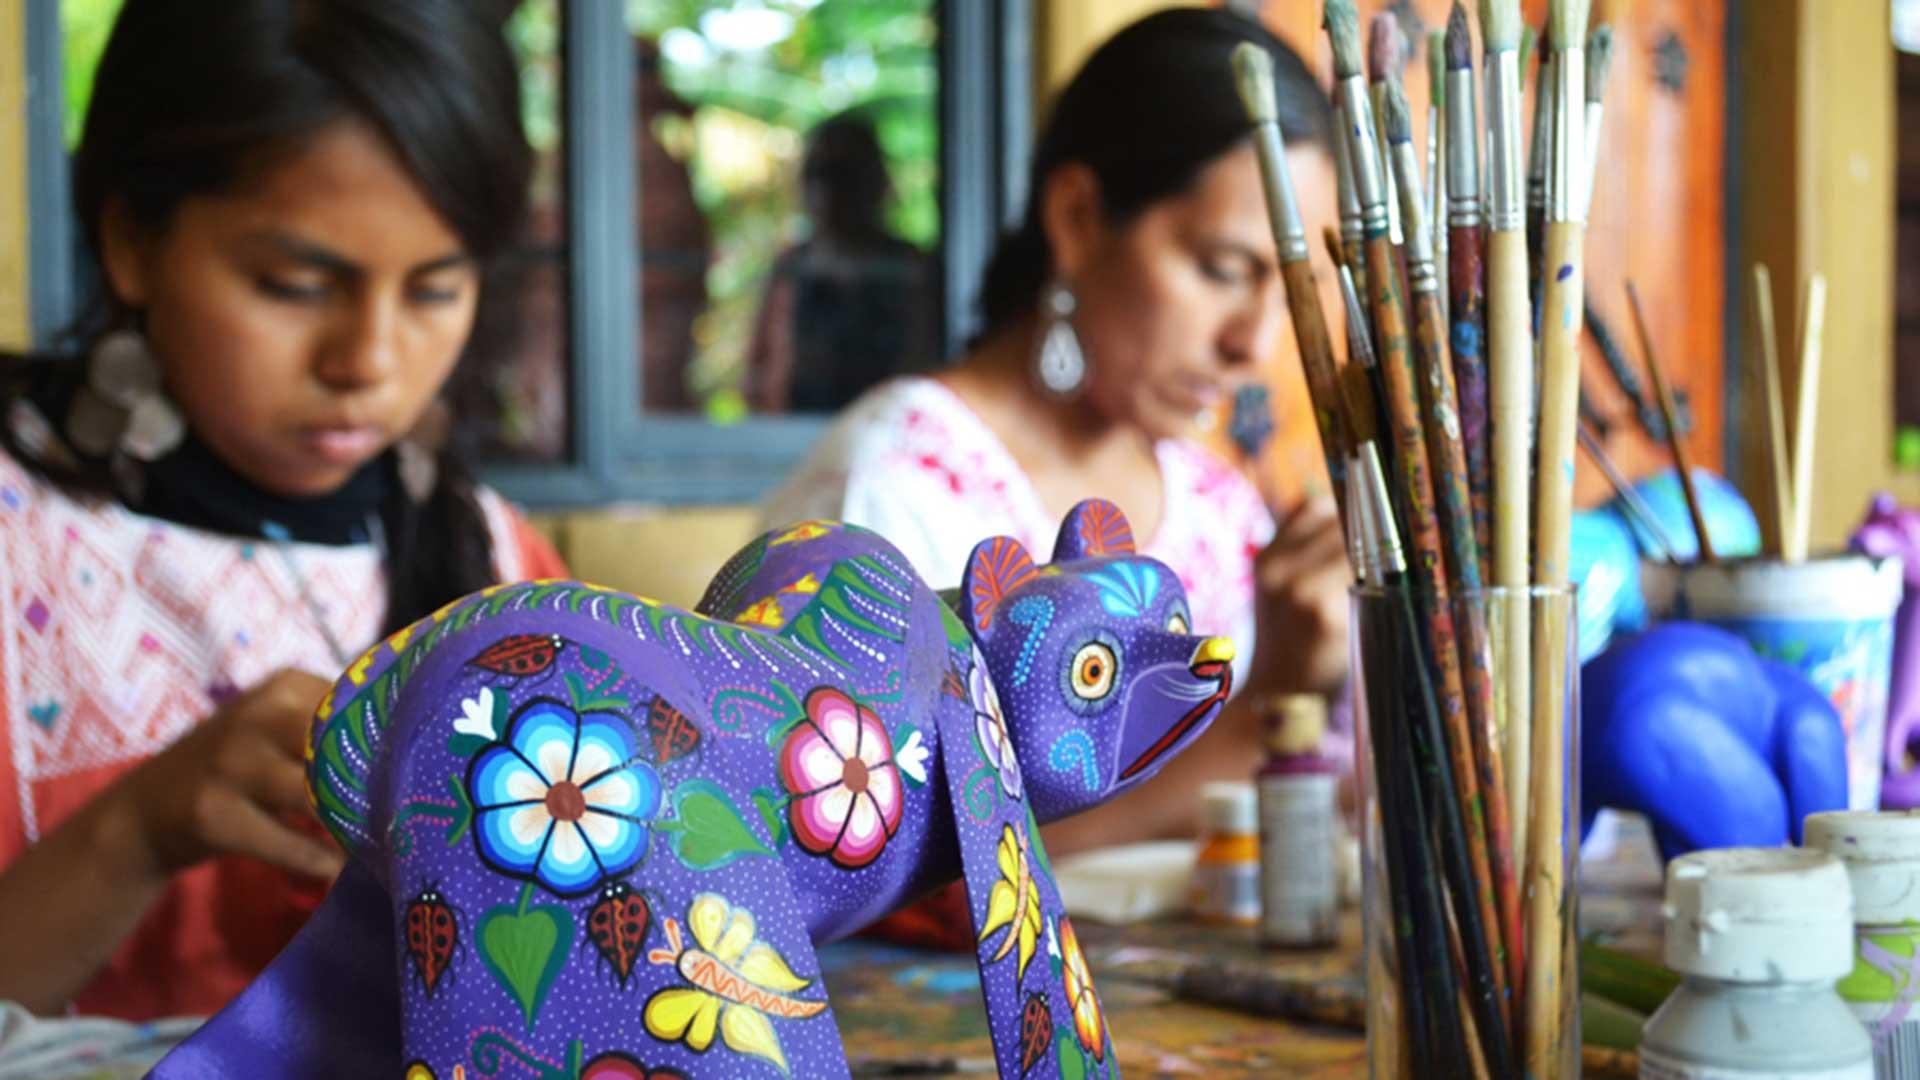 Artisans paint Mexican handicrafts in Oaxaca